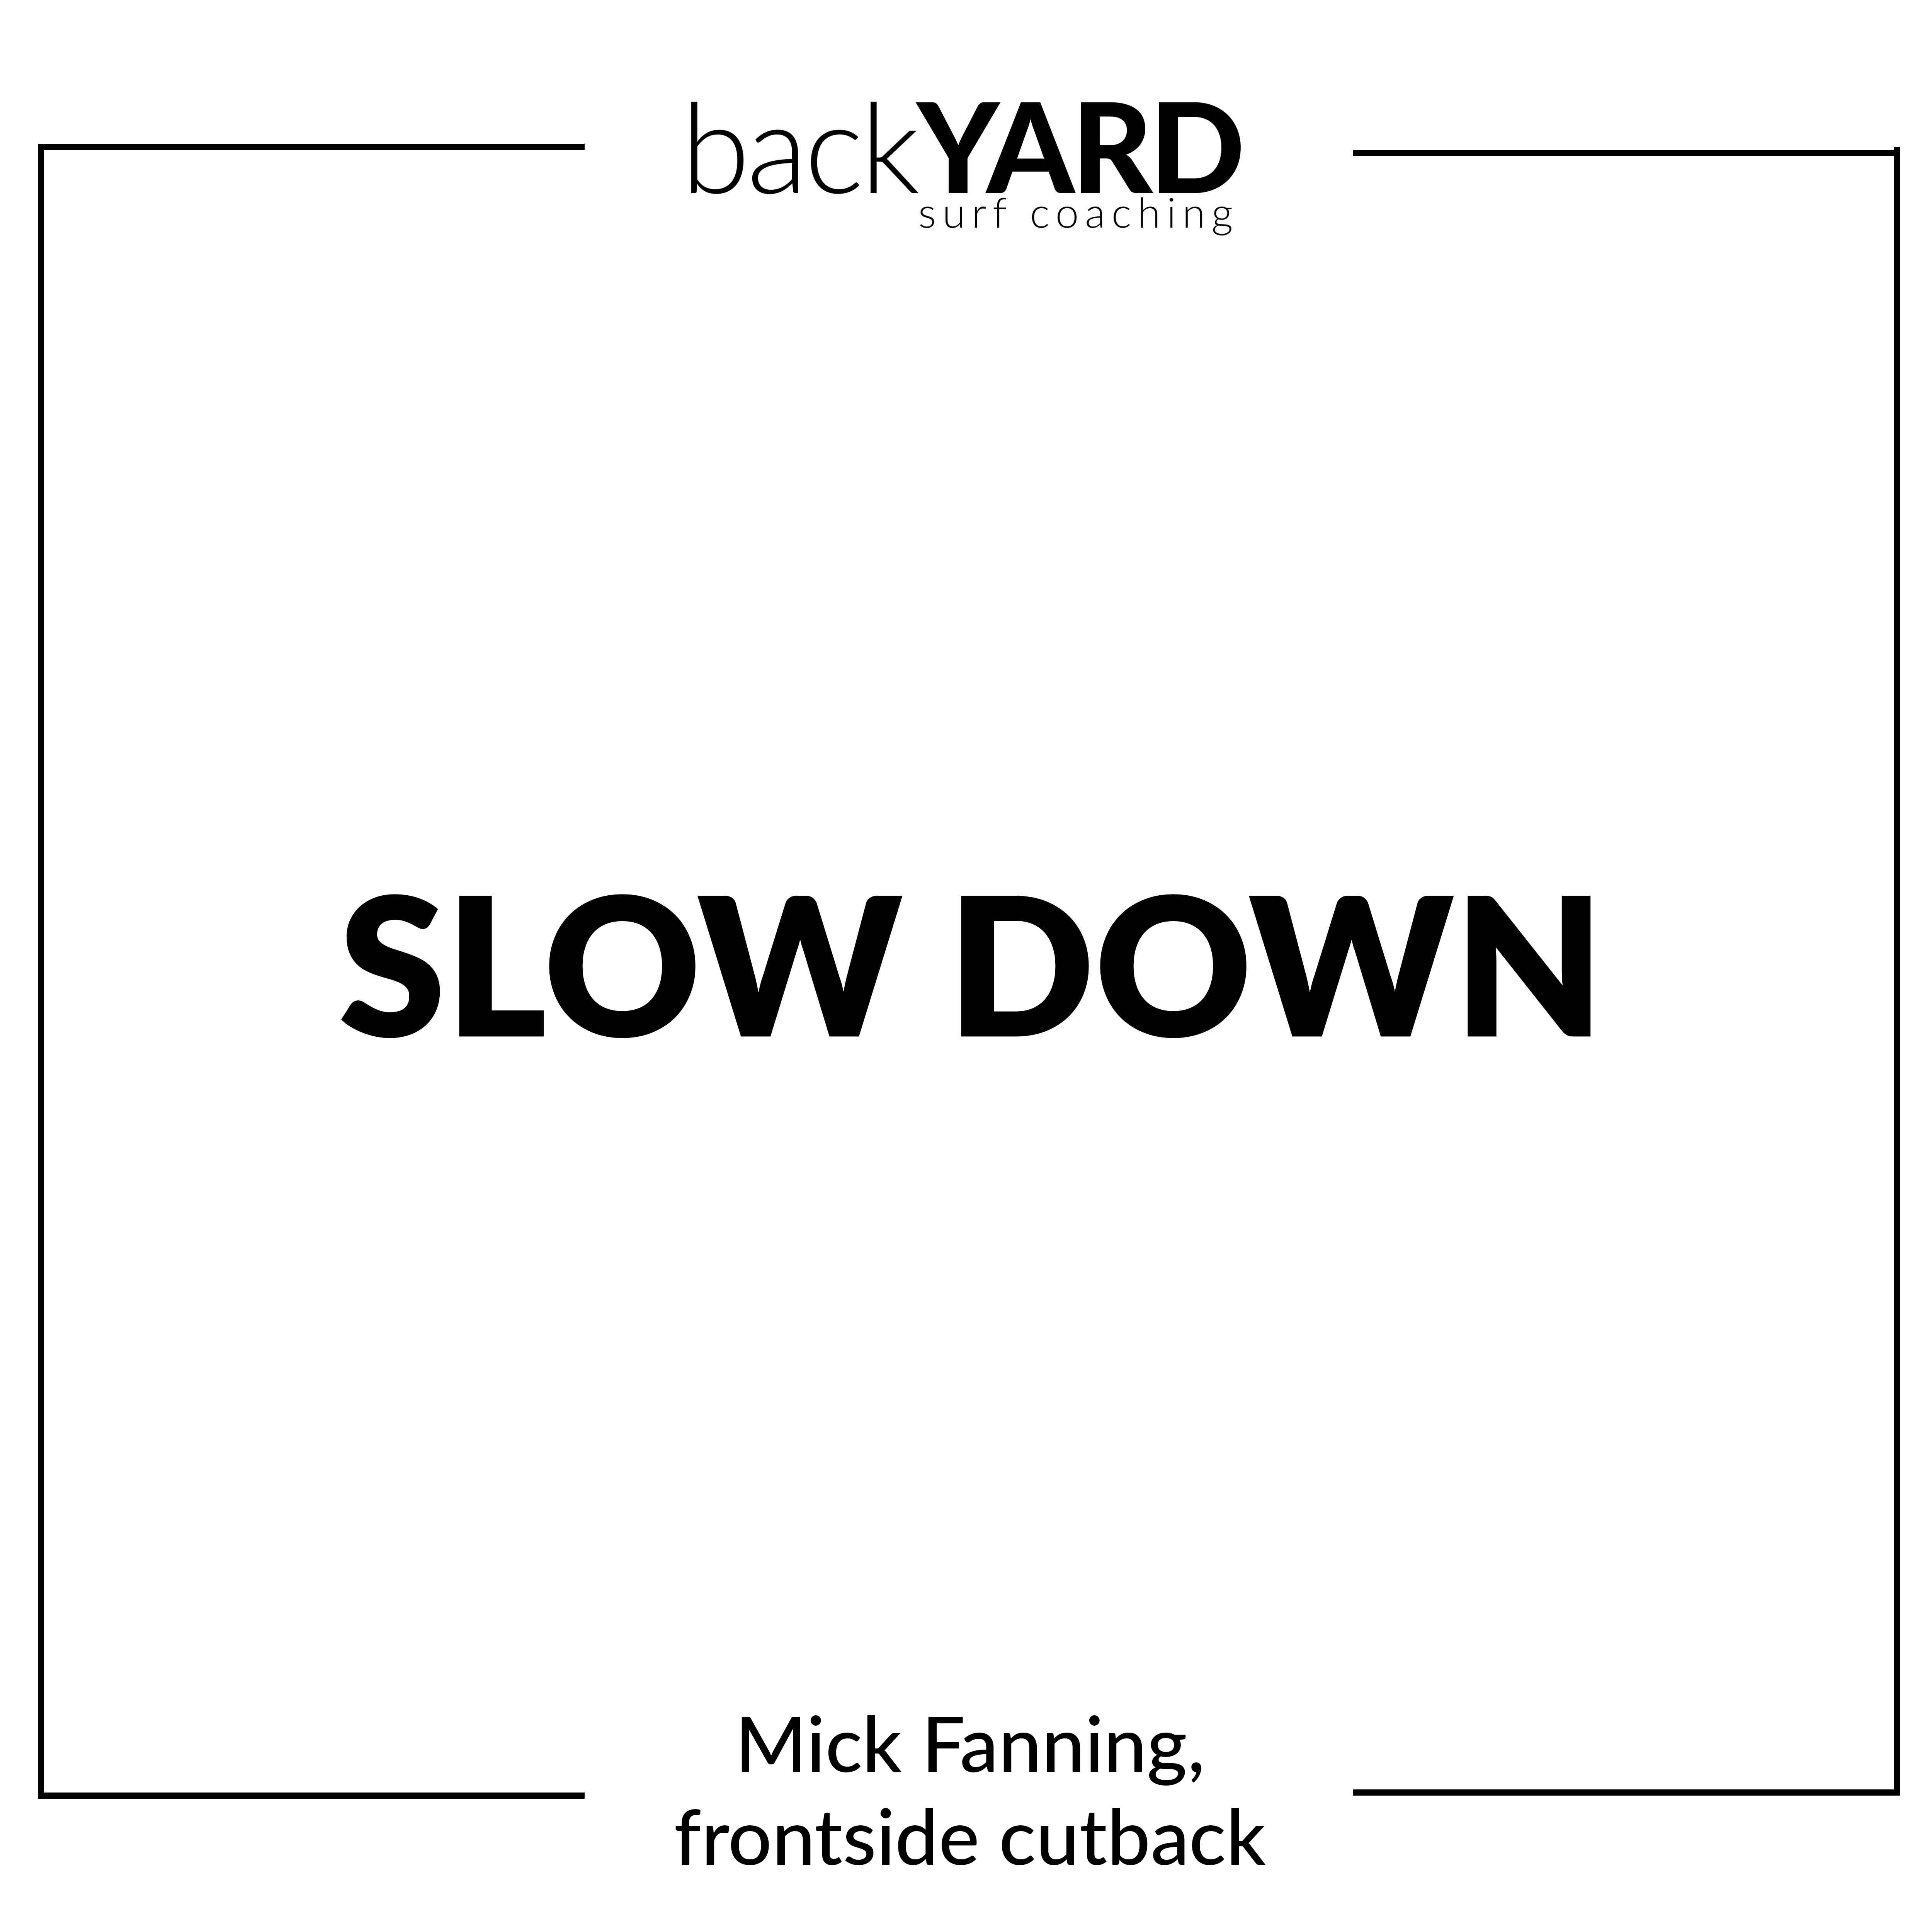 SLOW DOWN Mick Fanning, frontside cutback